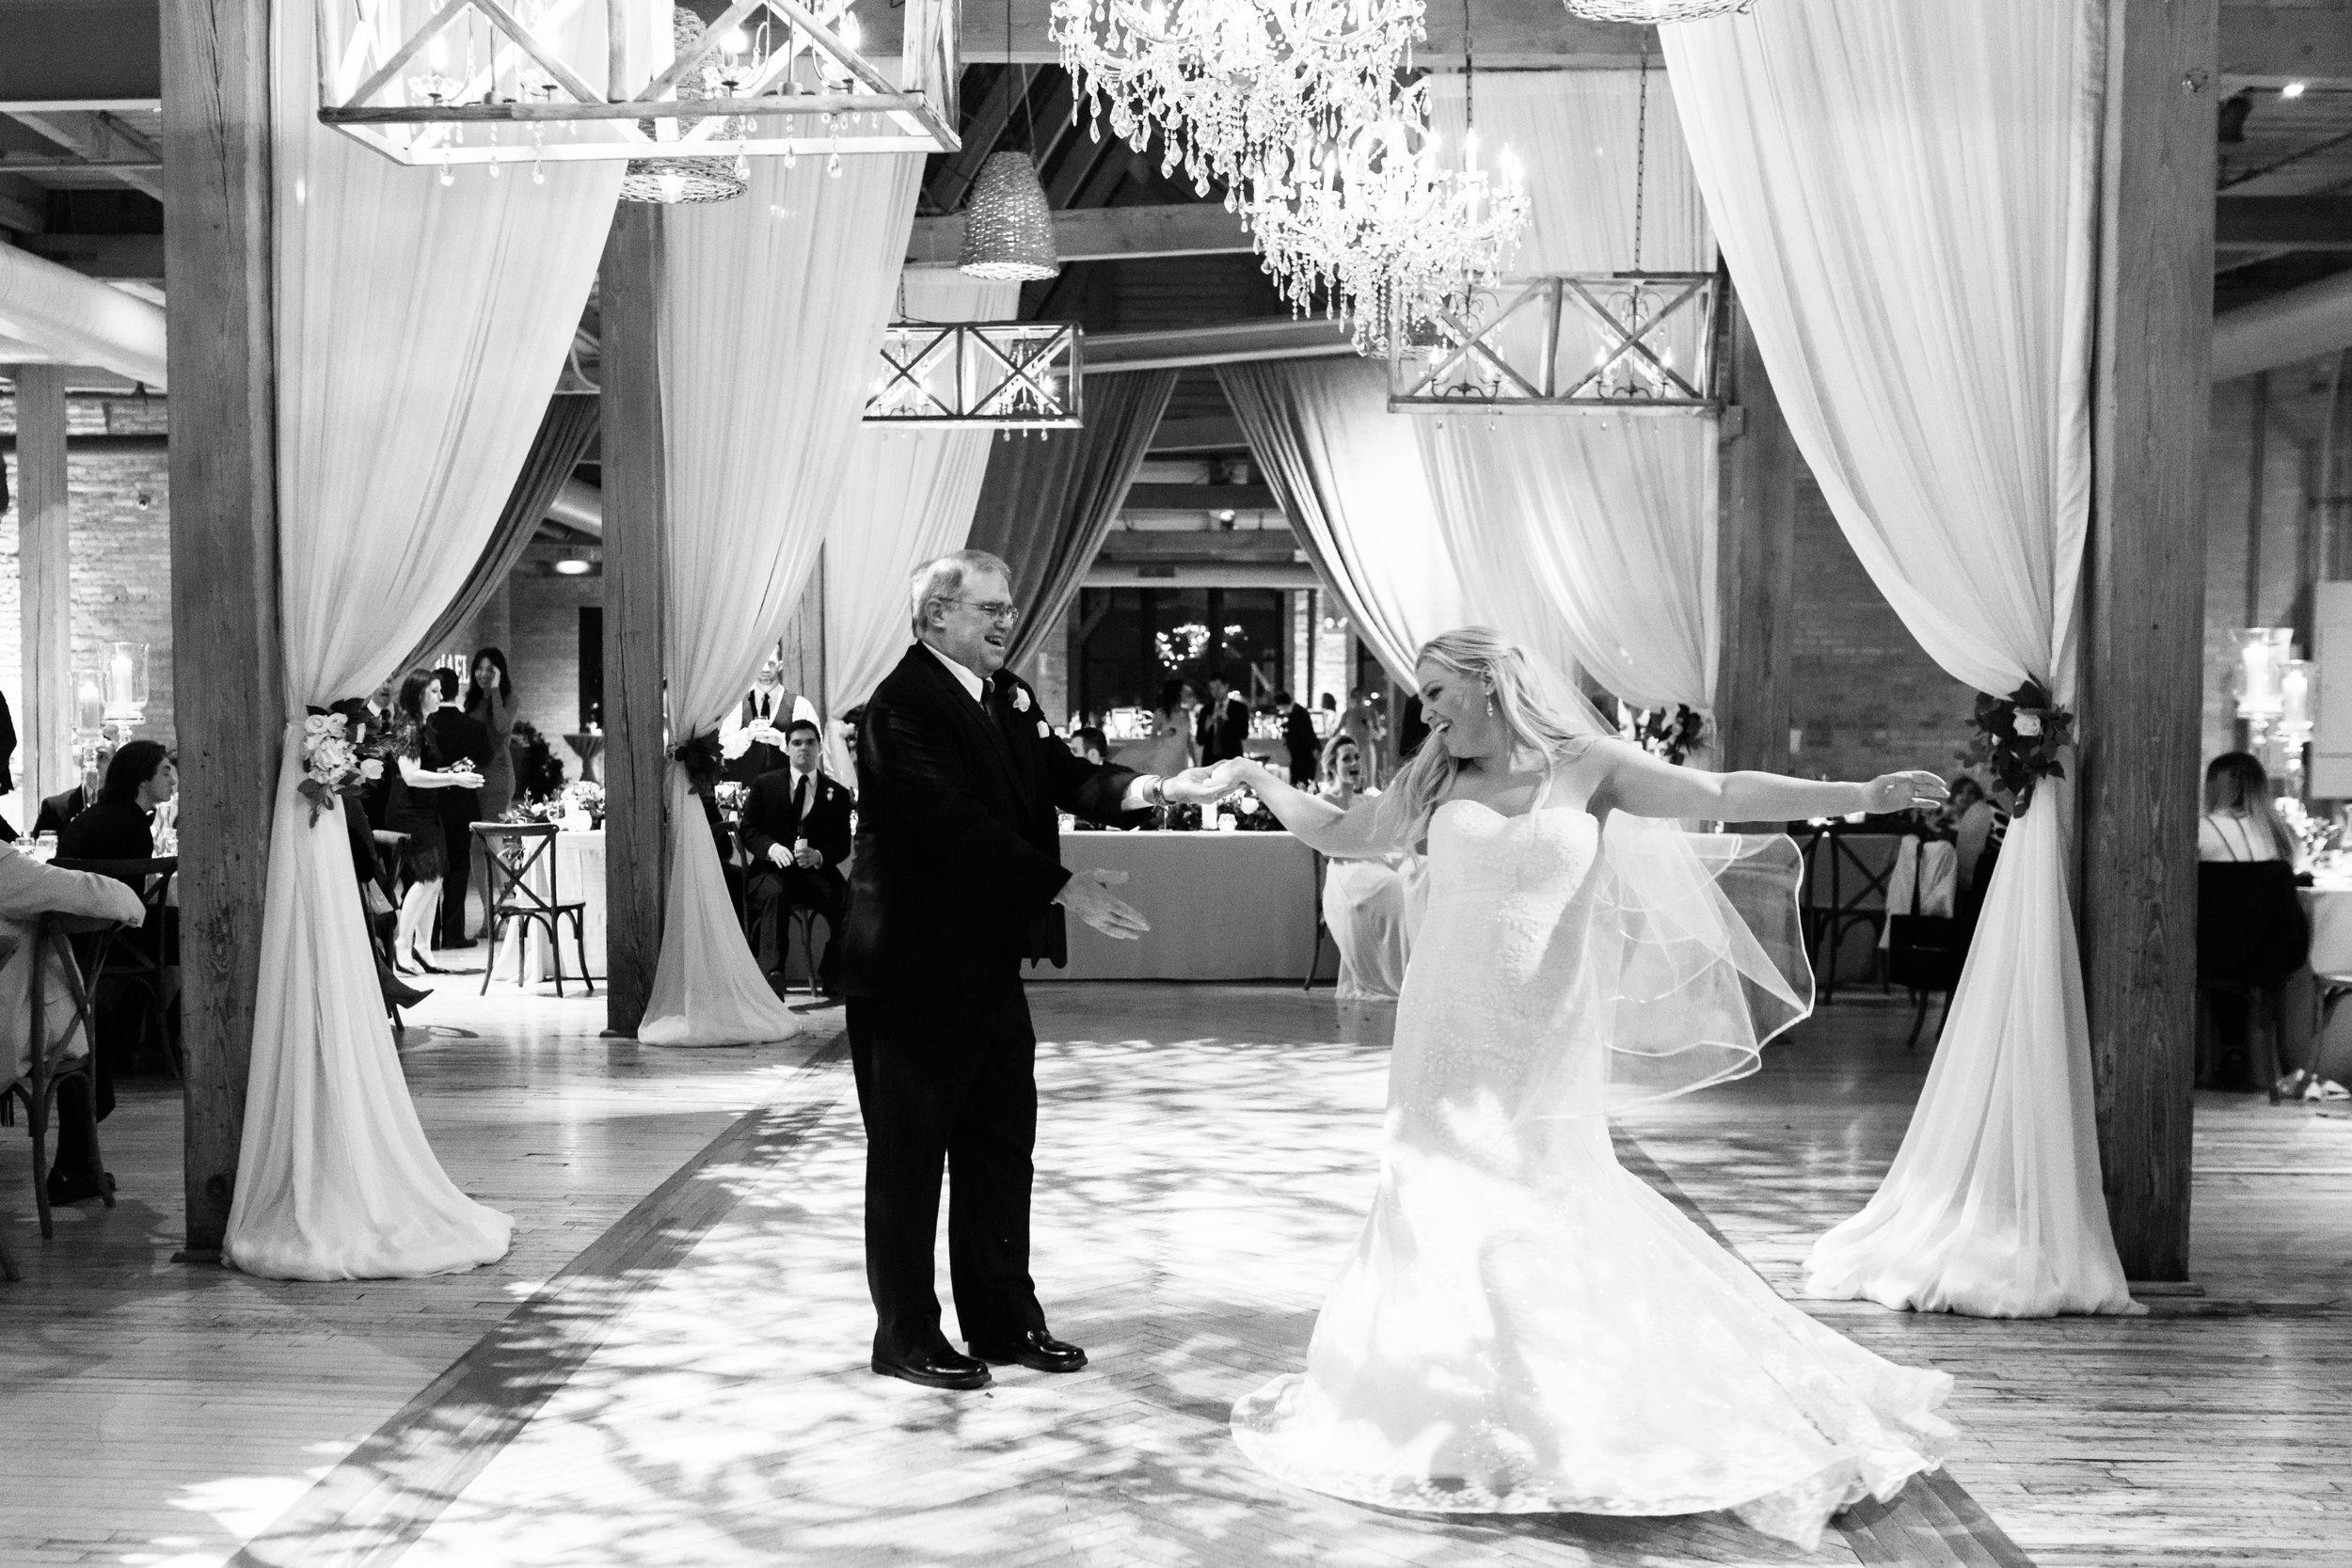 Rustic Bridgeport Art Center Wedding Chicago0111_2I8A9524.jpg